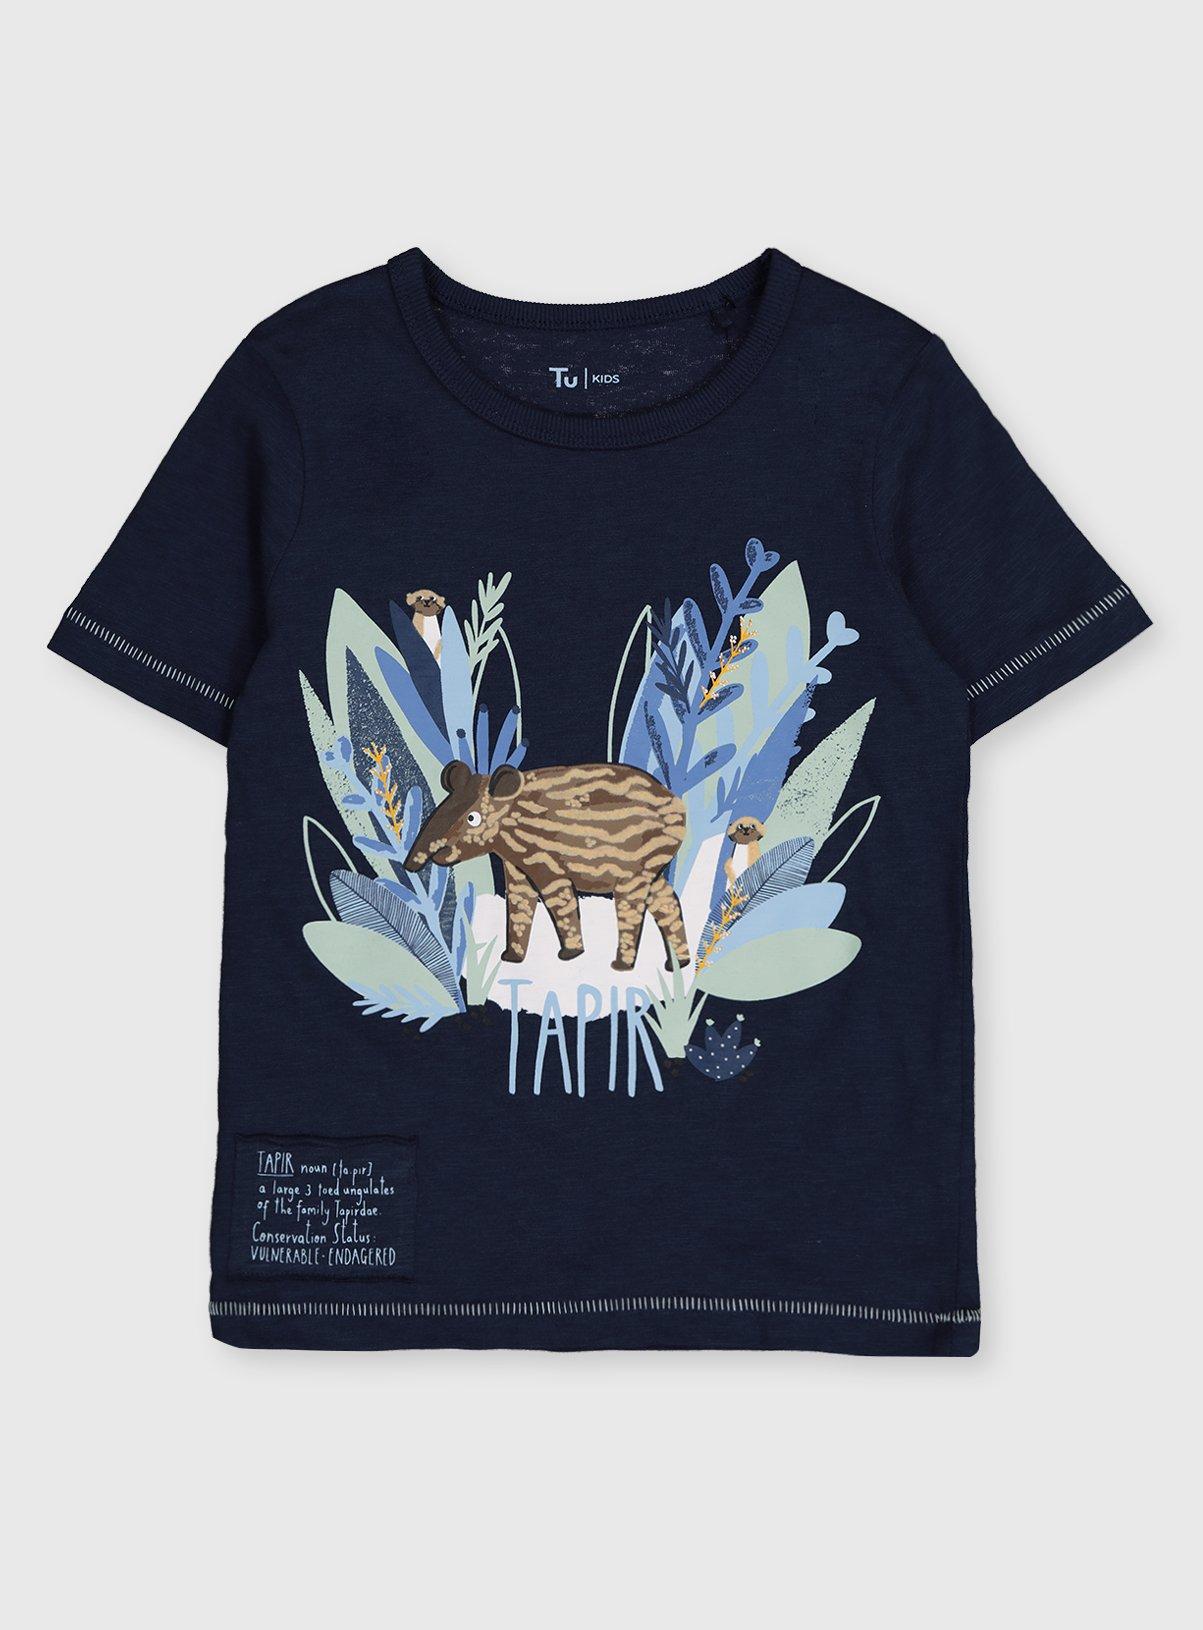 Kids Navy Endangered Species Tapir T-Shirt 100% Cotton £2 - £2.25 (Click & Collect) @ Argos